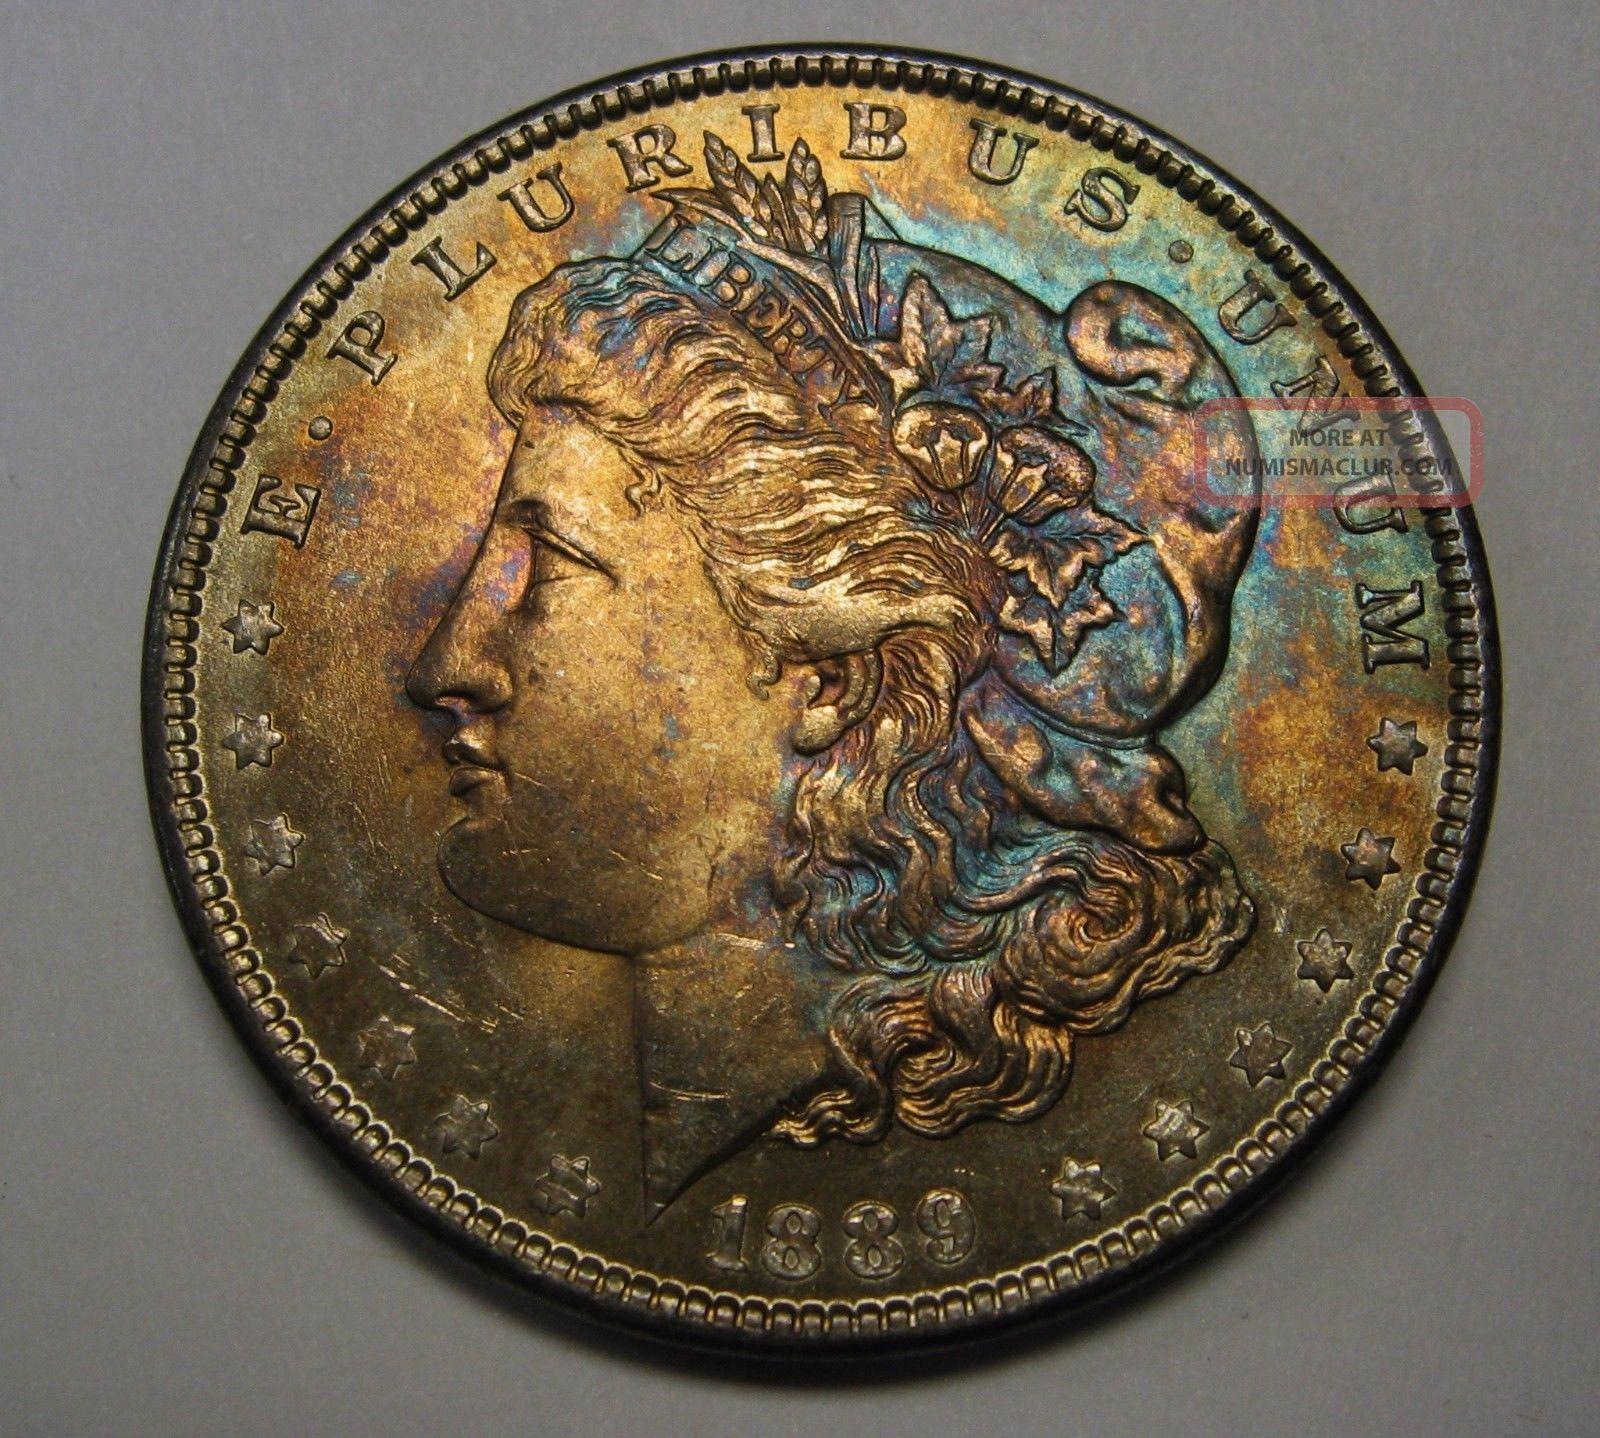 Stunning Rainbow Toned 1889 Morgan Silver Dollar Grading